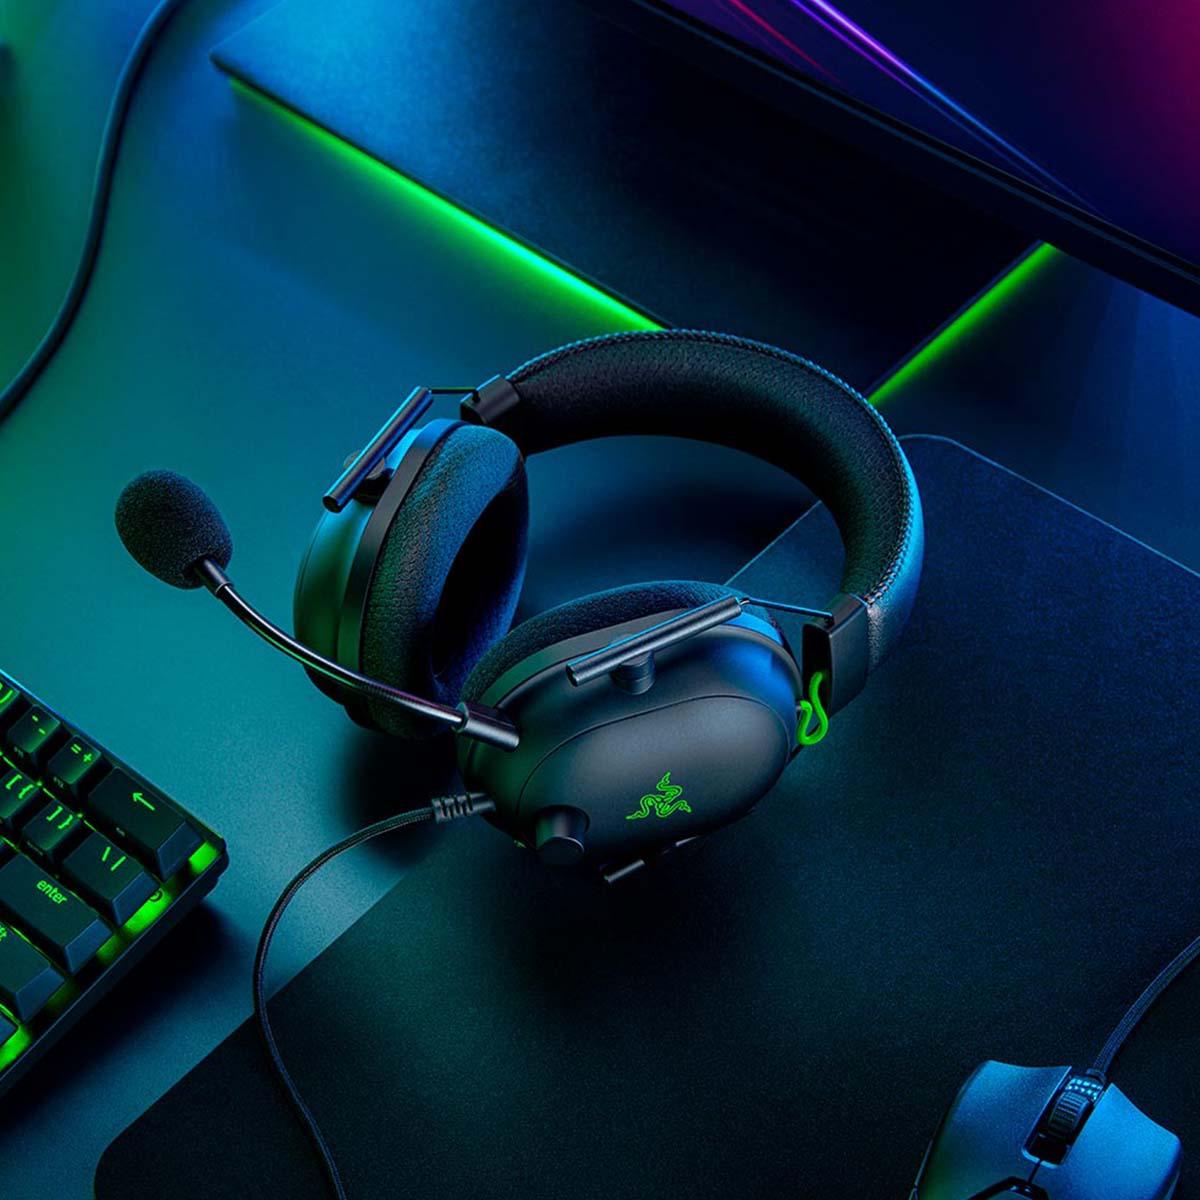 Razer Blackshark V2 обзор игровой гарнитуры